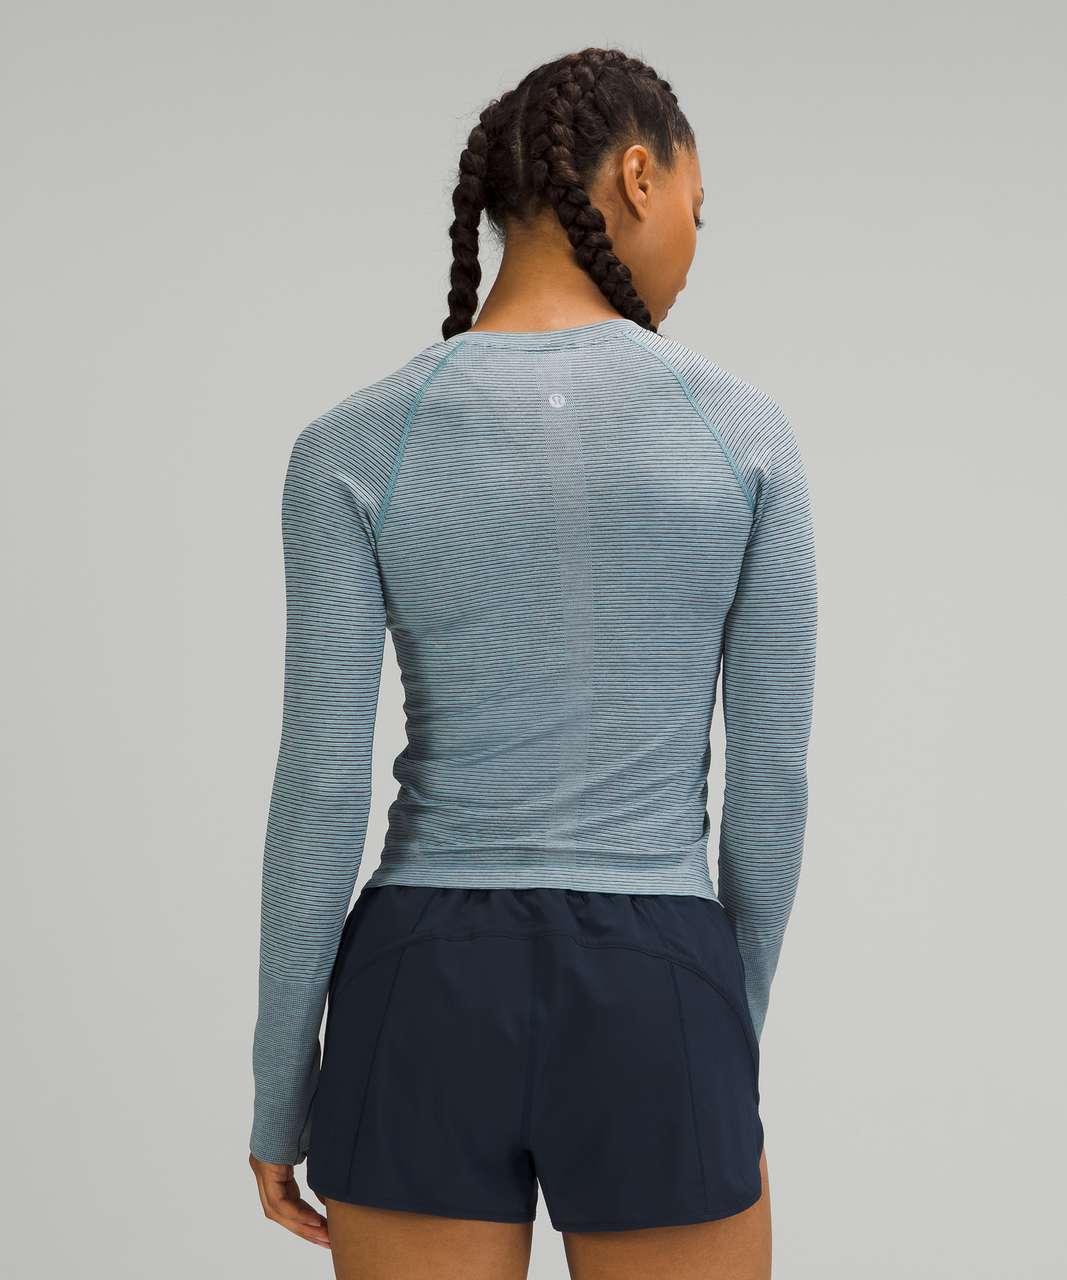 Lululemon Swiftly Tech Long Sleeve 2.0 *Race Length - Tetra Stripe Rhino Grey / Black / Icing Blue / Turquoise Tide